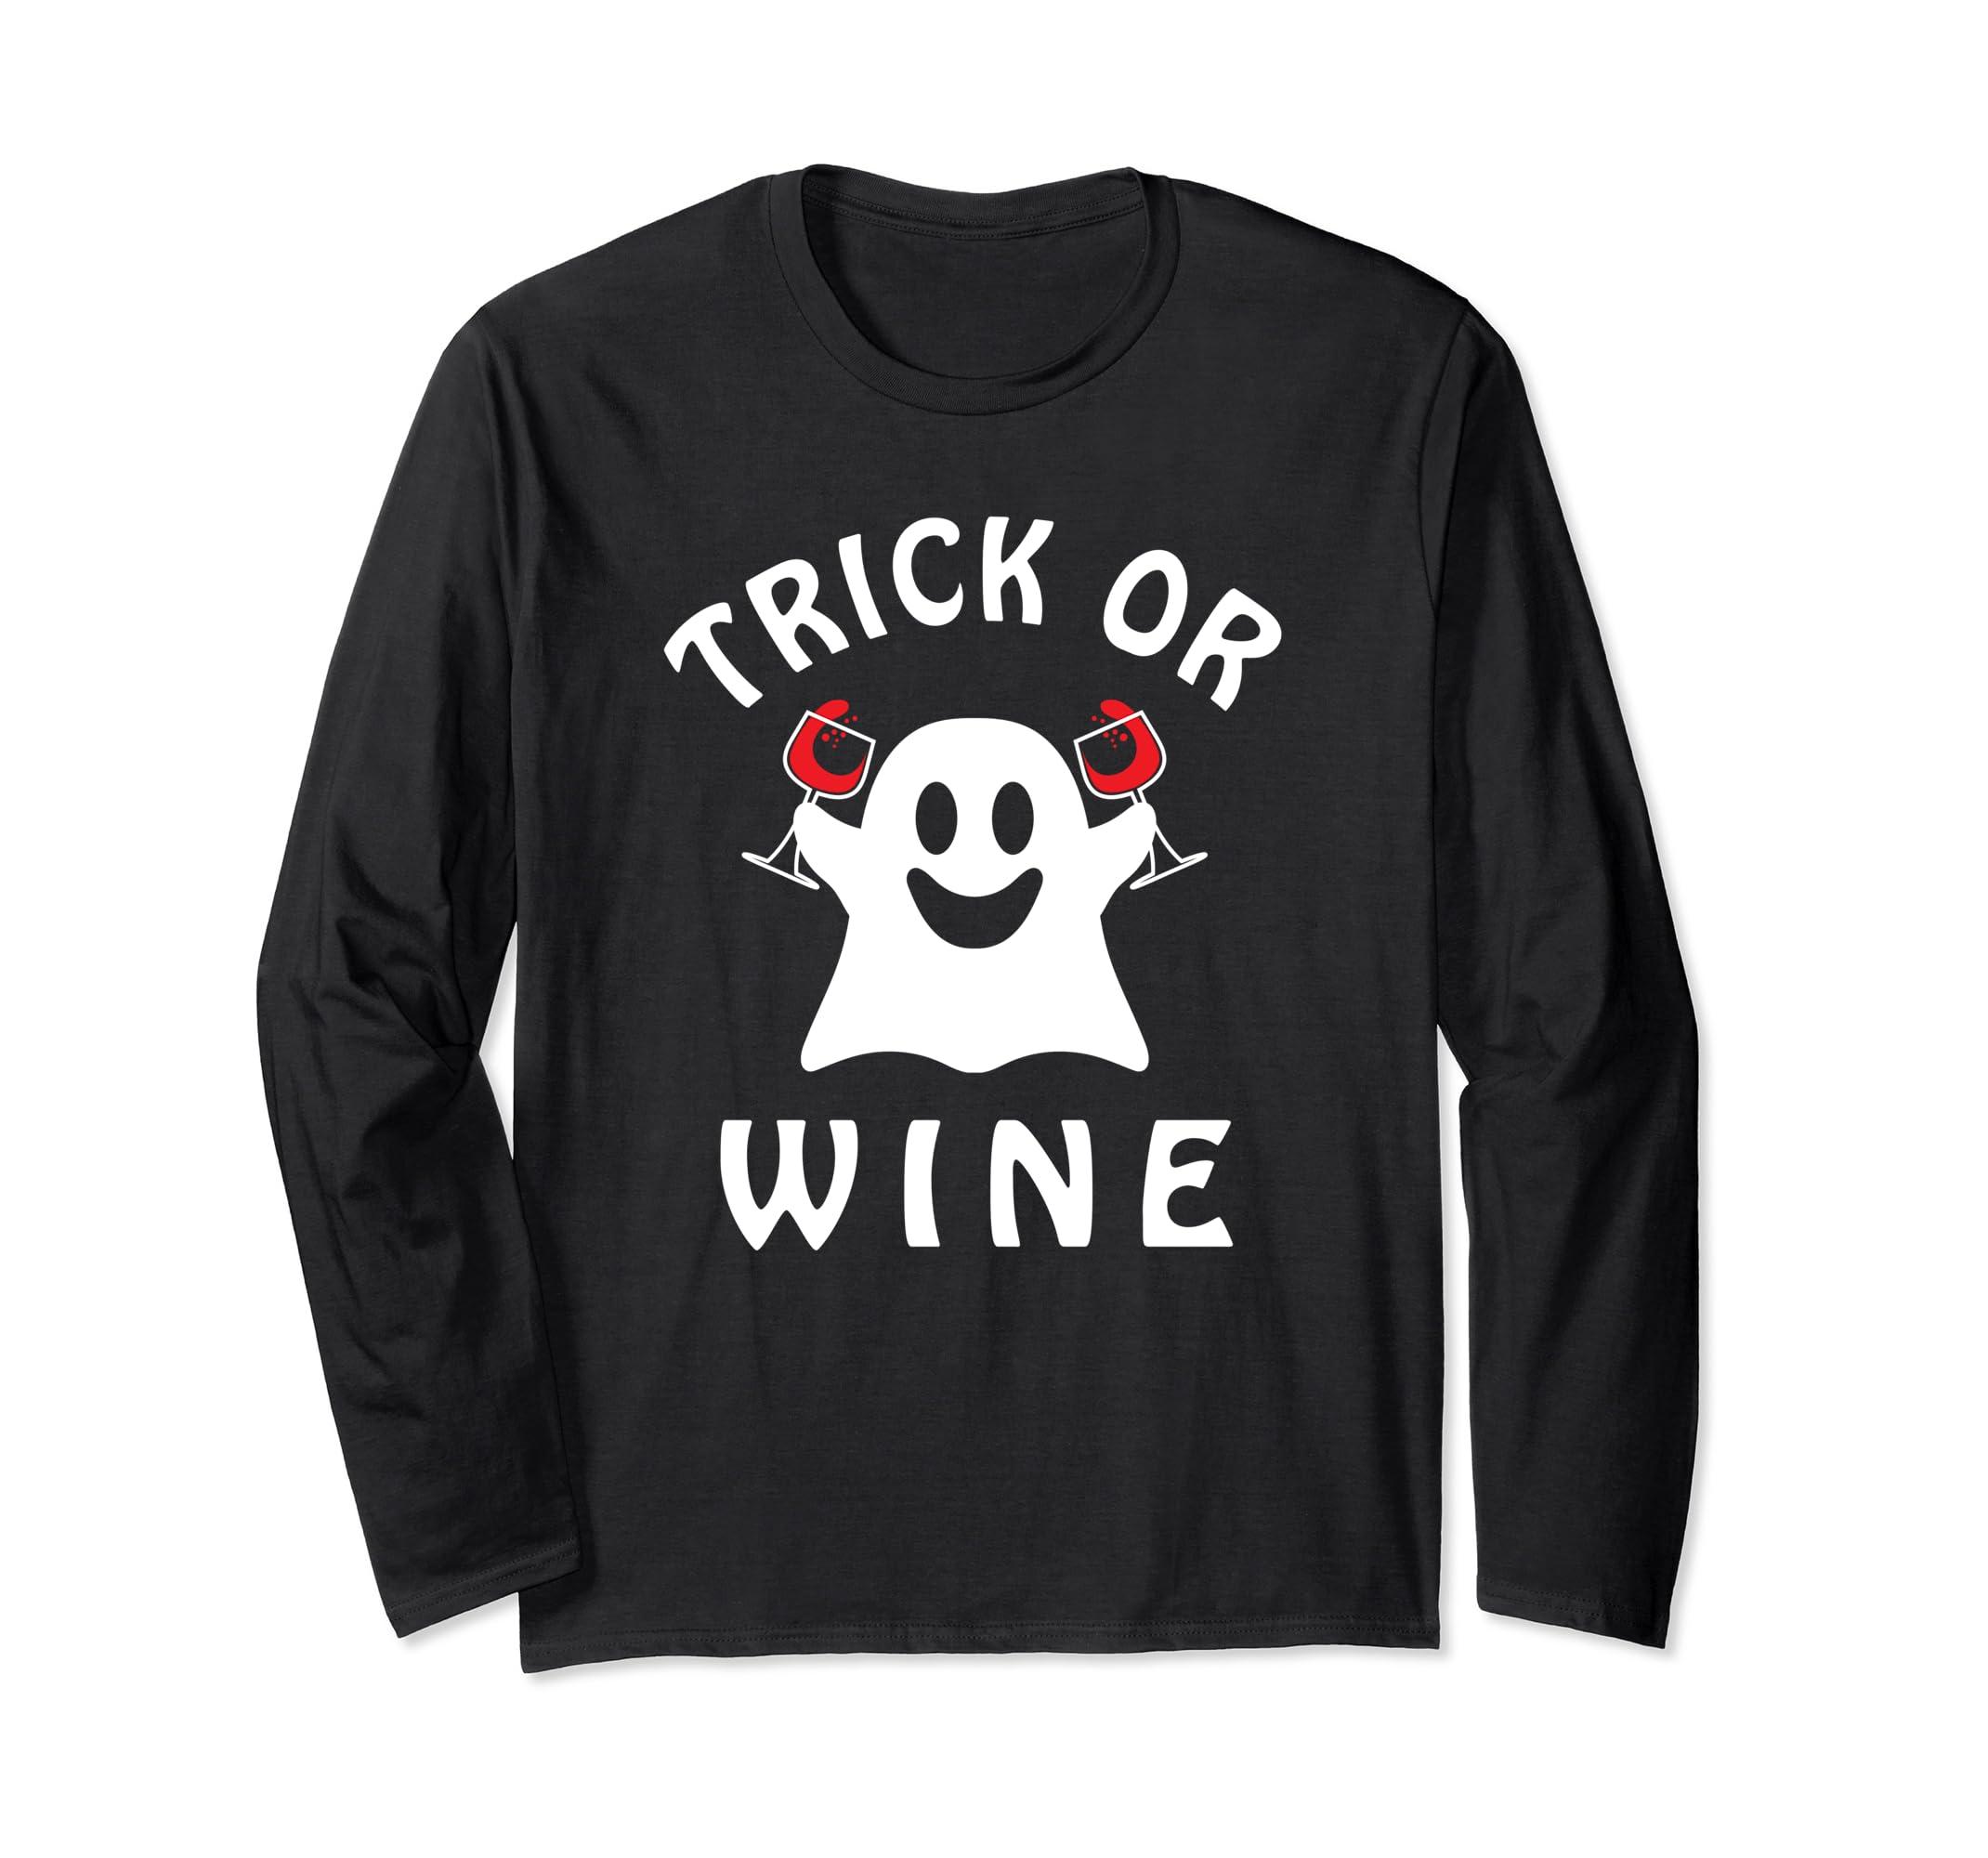 afb5ed609 Amazon.com: Trick or Wine Funny Halloween Drinking Long Sleeve Shirt:  Clothing